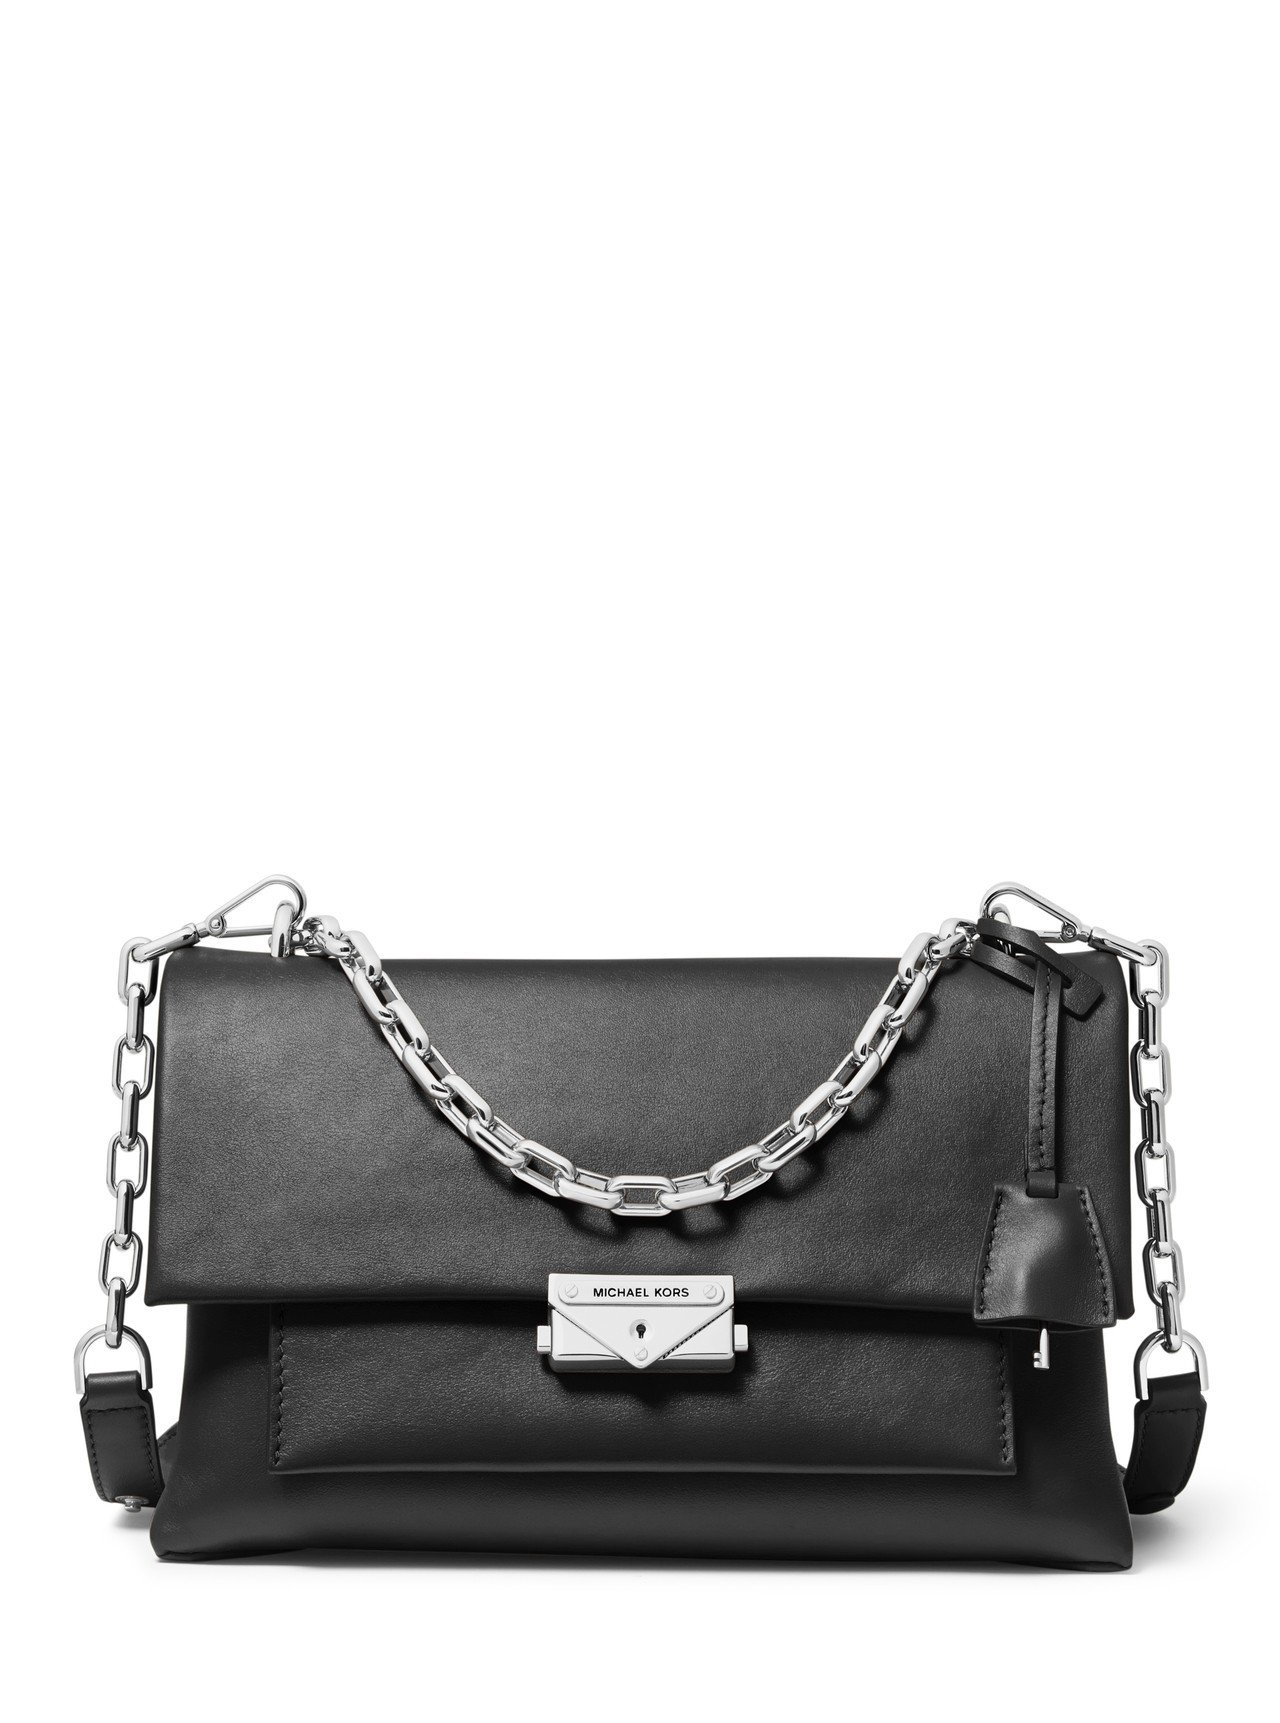 CECE黑色大型鍊包,售價18700元。圖/MICHAEL KORS提供